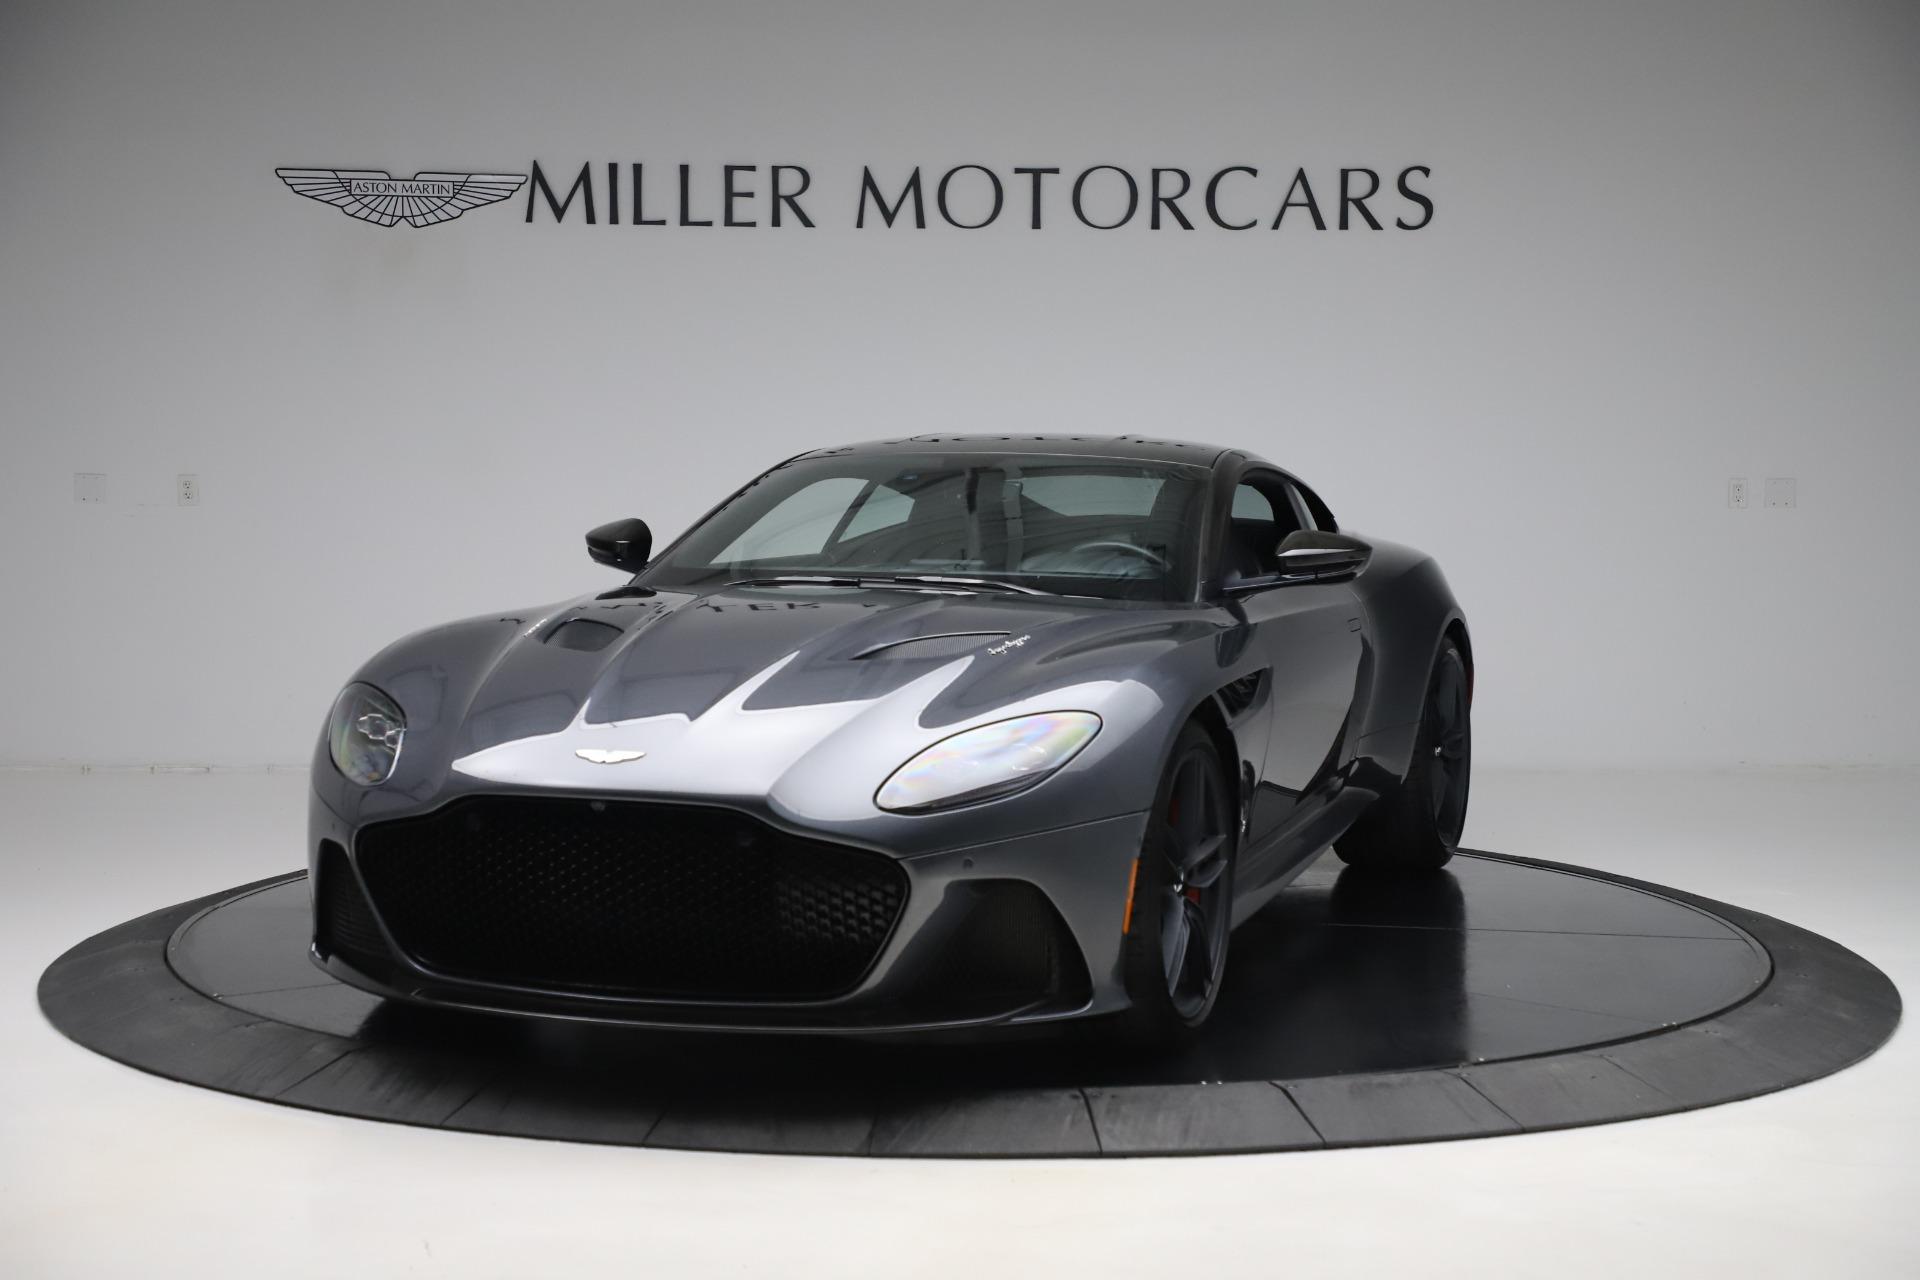 Used 2019 Aston Martin DBS Superleggera Coupe For Sale In Greenwich, CT. Alfa Romeo of Greenwich, A1438B 3570_p2